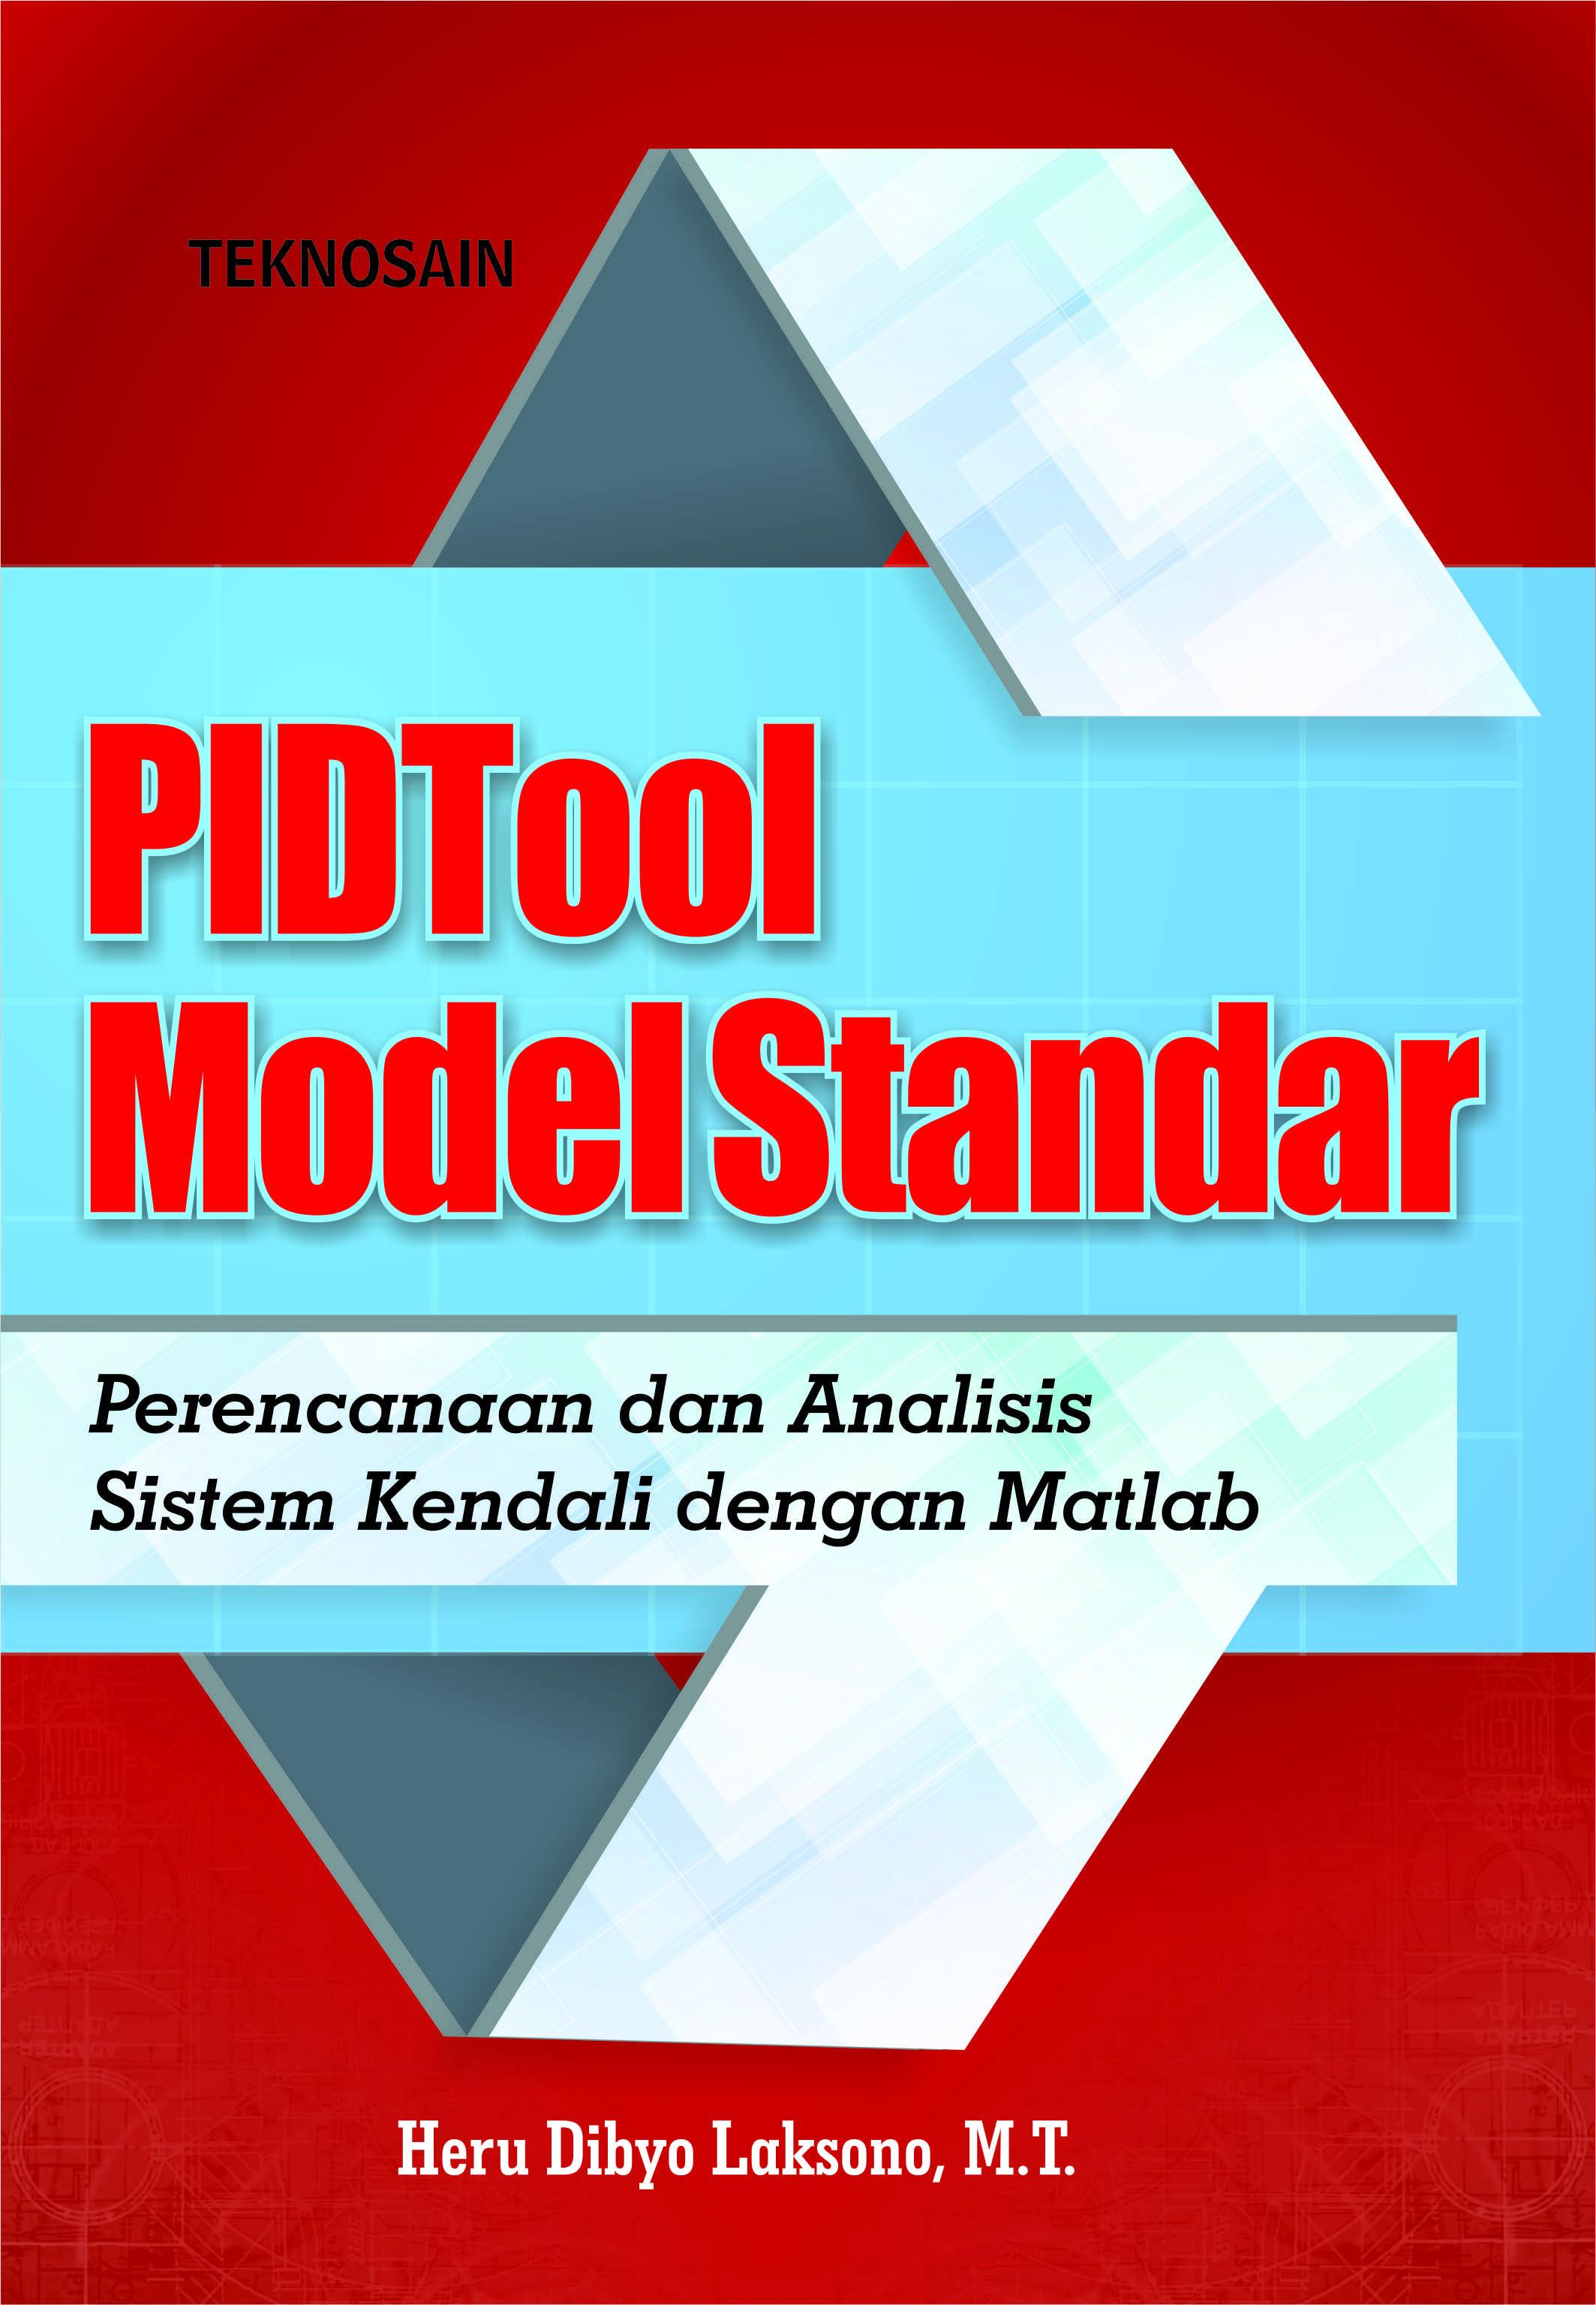 PIDtool Model Standar [sumber elektronis]